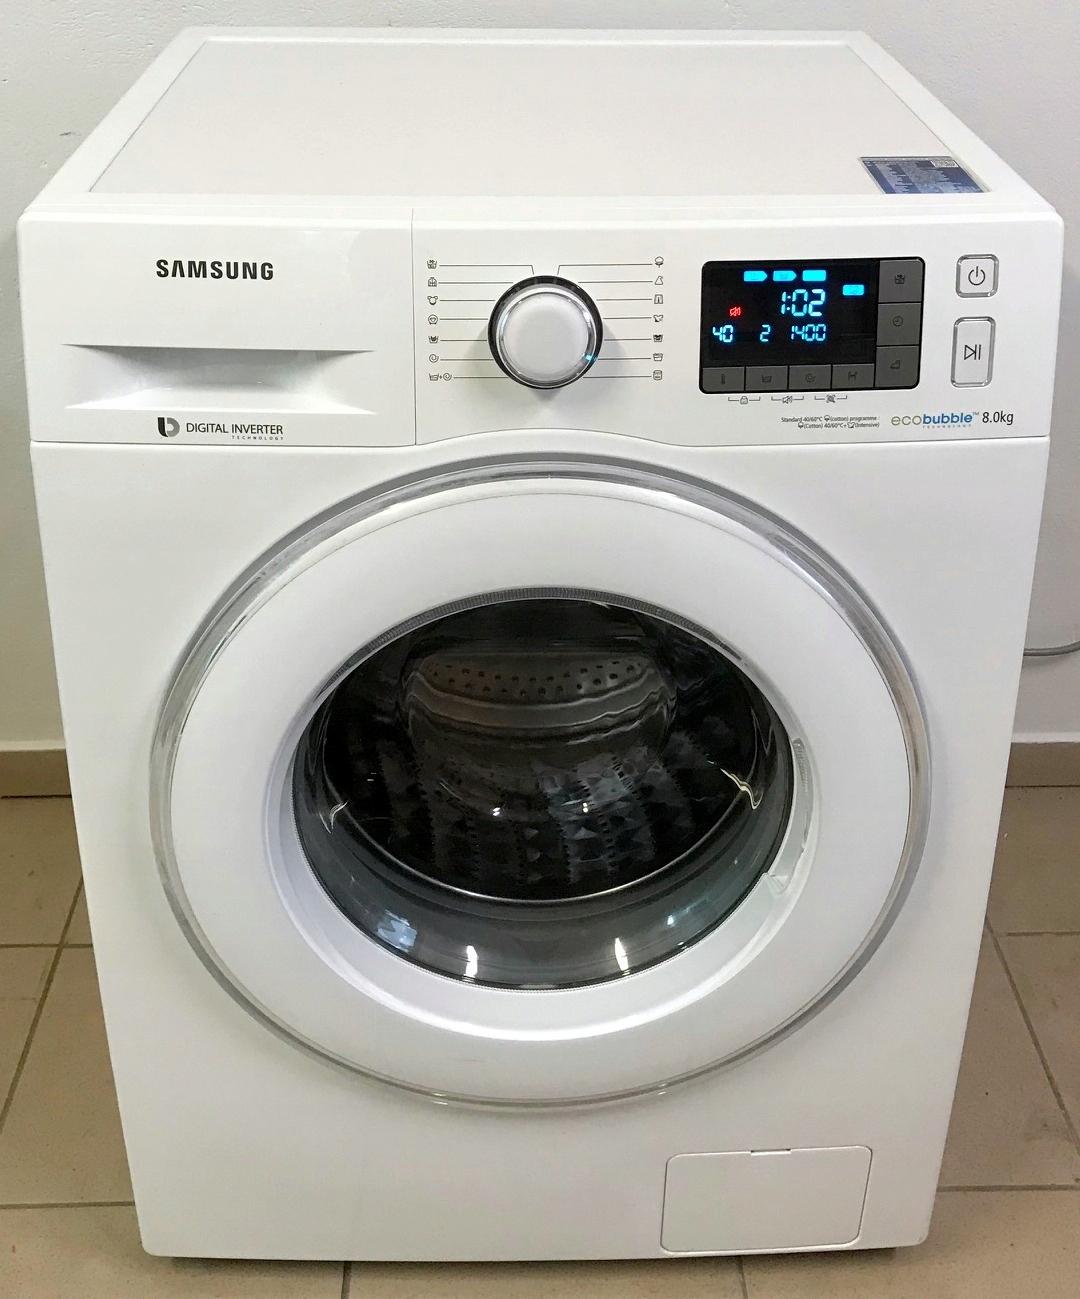 Pralka Samsung Eco Bubble 8kg A+++ 1400obr/min GW